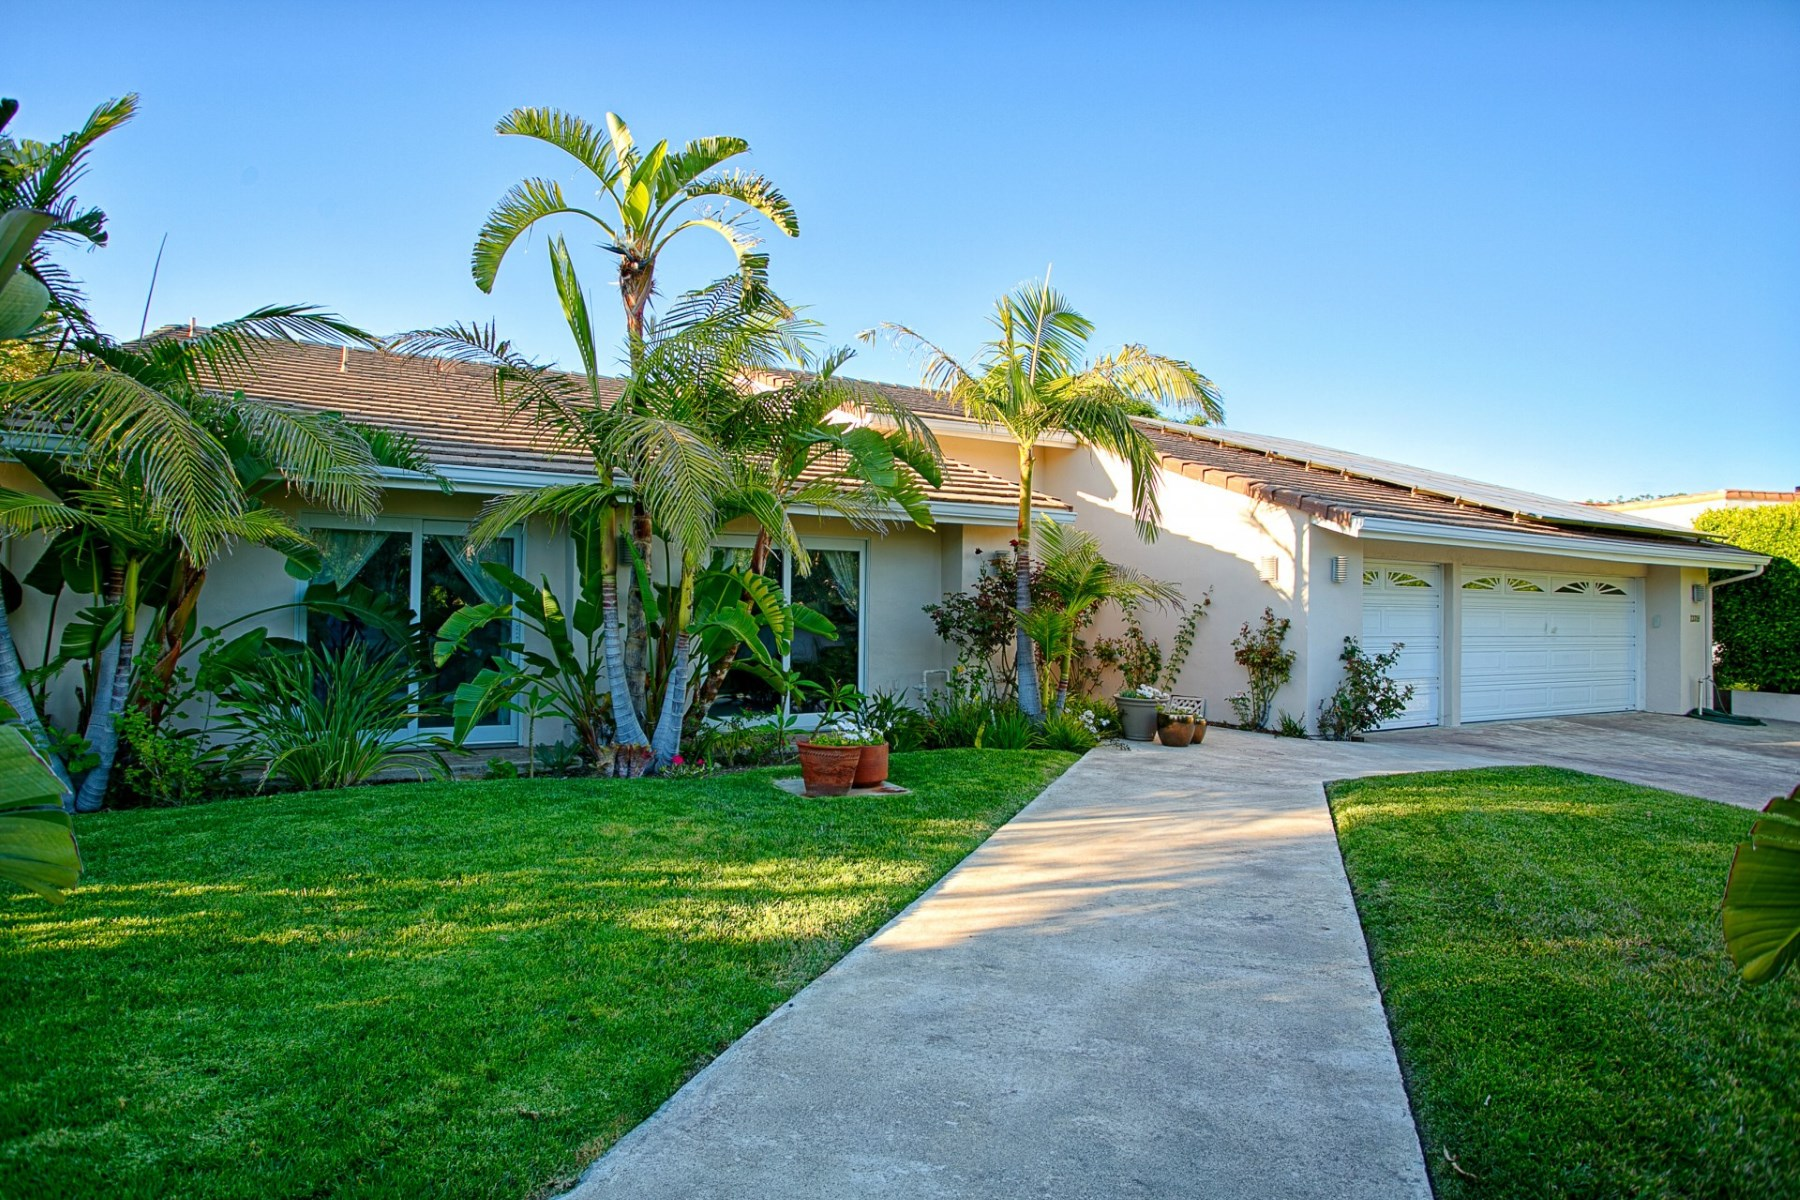 Single Family Home for Sale at Sea View Estates home 23319 W Bocana Street Malibu, California, 90265 United States